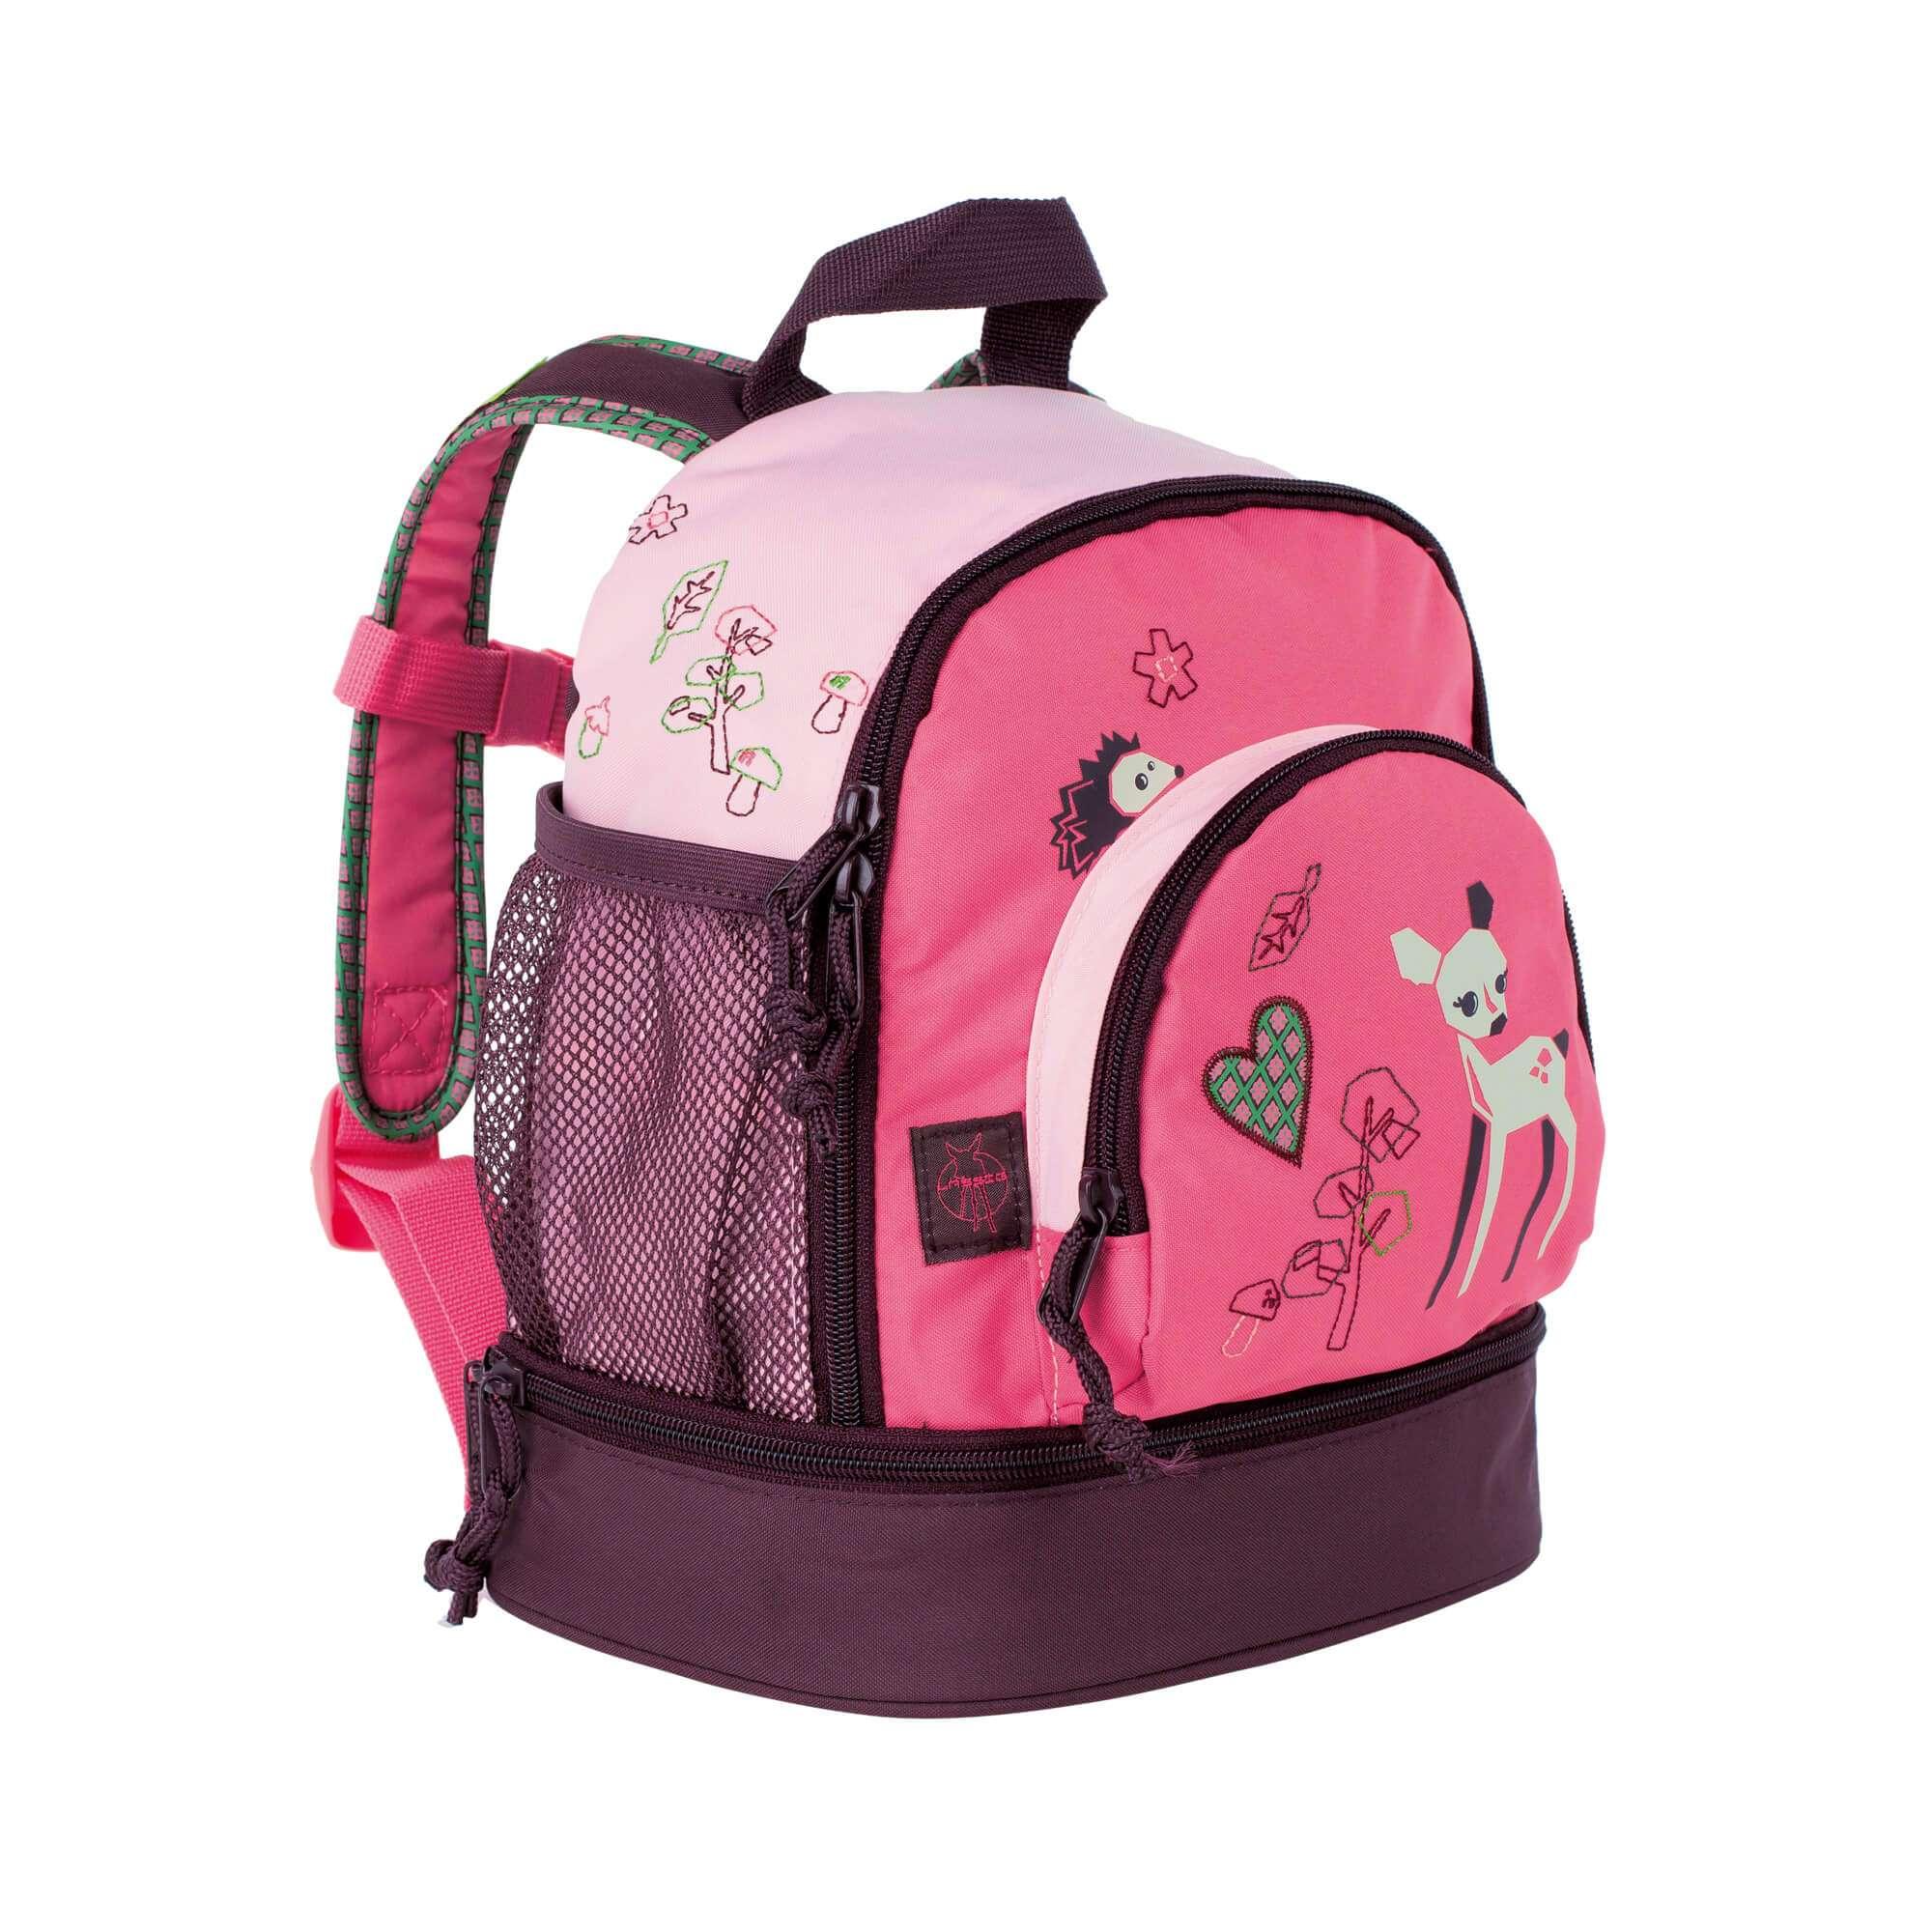 ae732fd818 LASSIG Mini Backpack Little Tree - Fawn